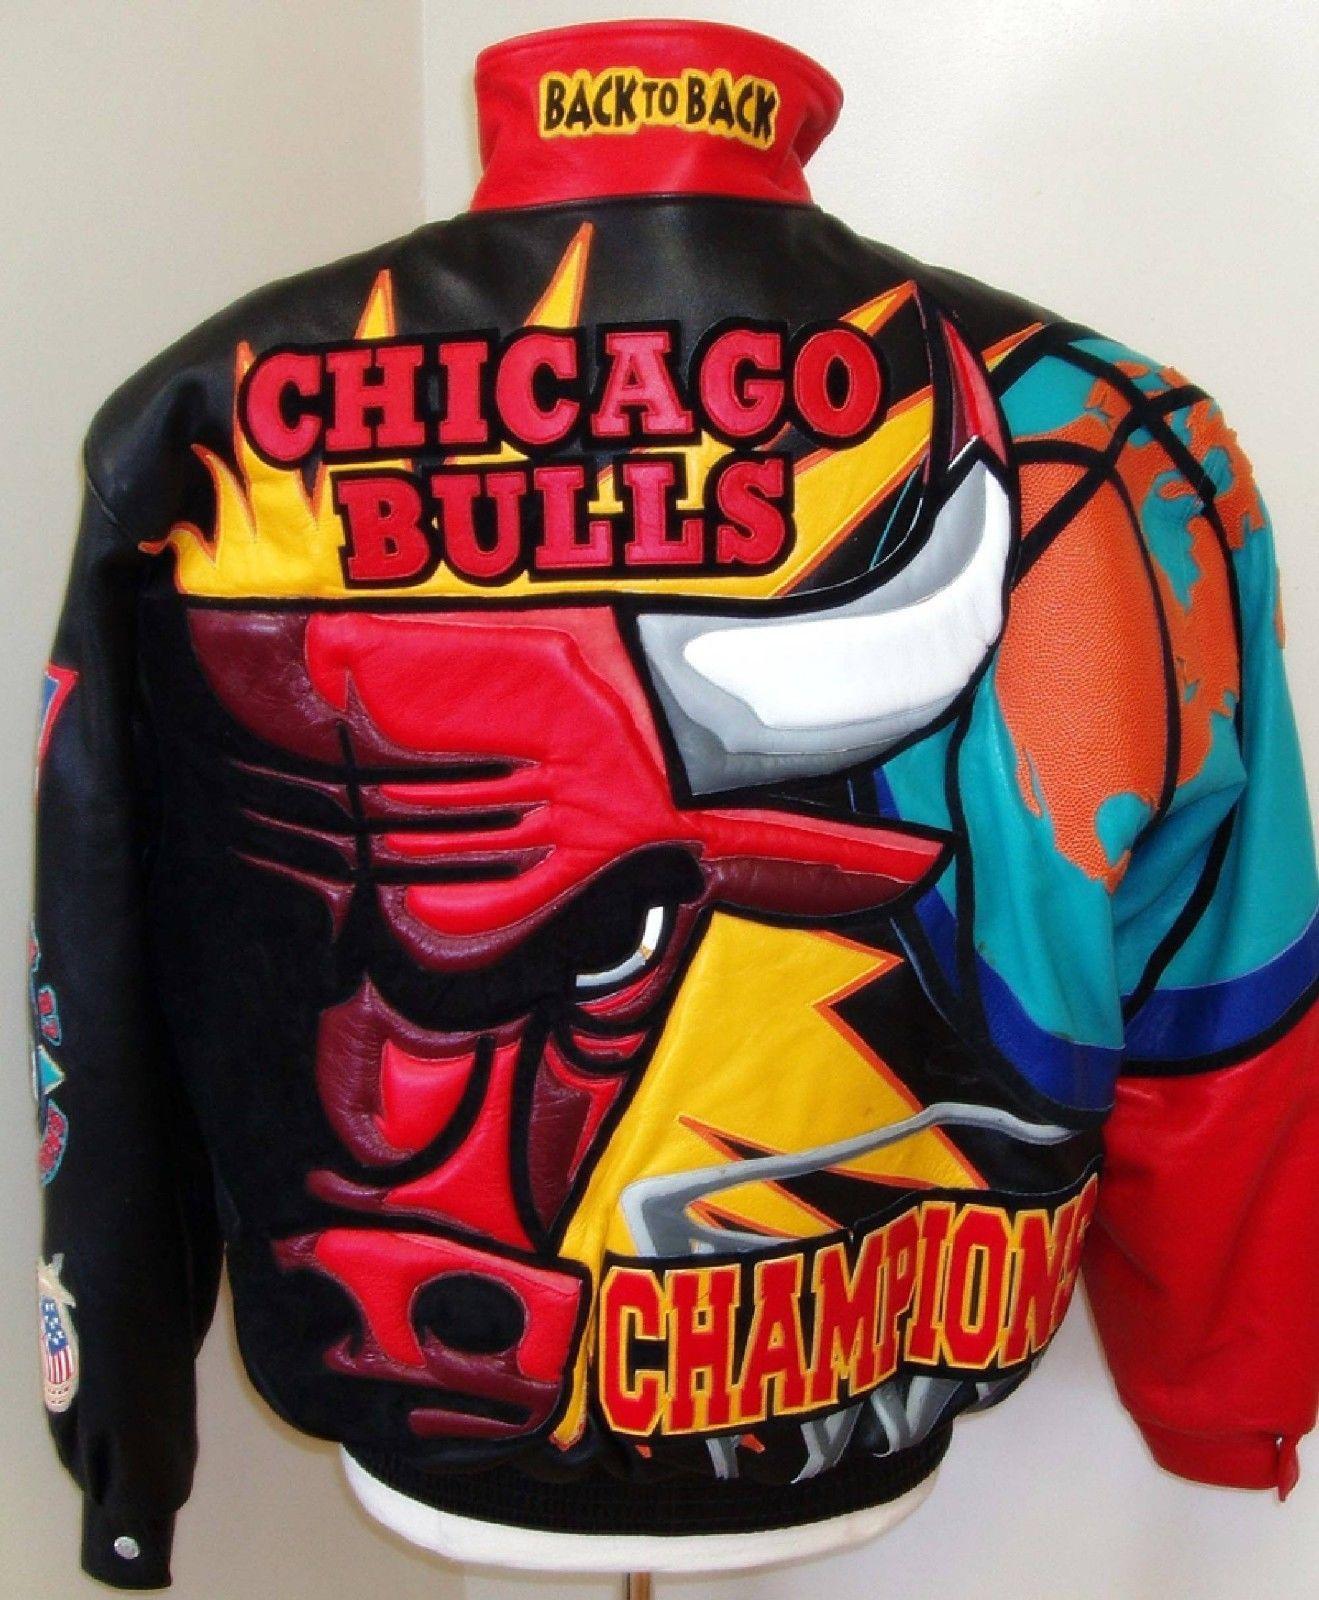 Vintage Chicago Bulls Nba Jordan Era Leather Jacket Large Products Hot Sale j.h. Jeff Hamilton